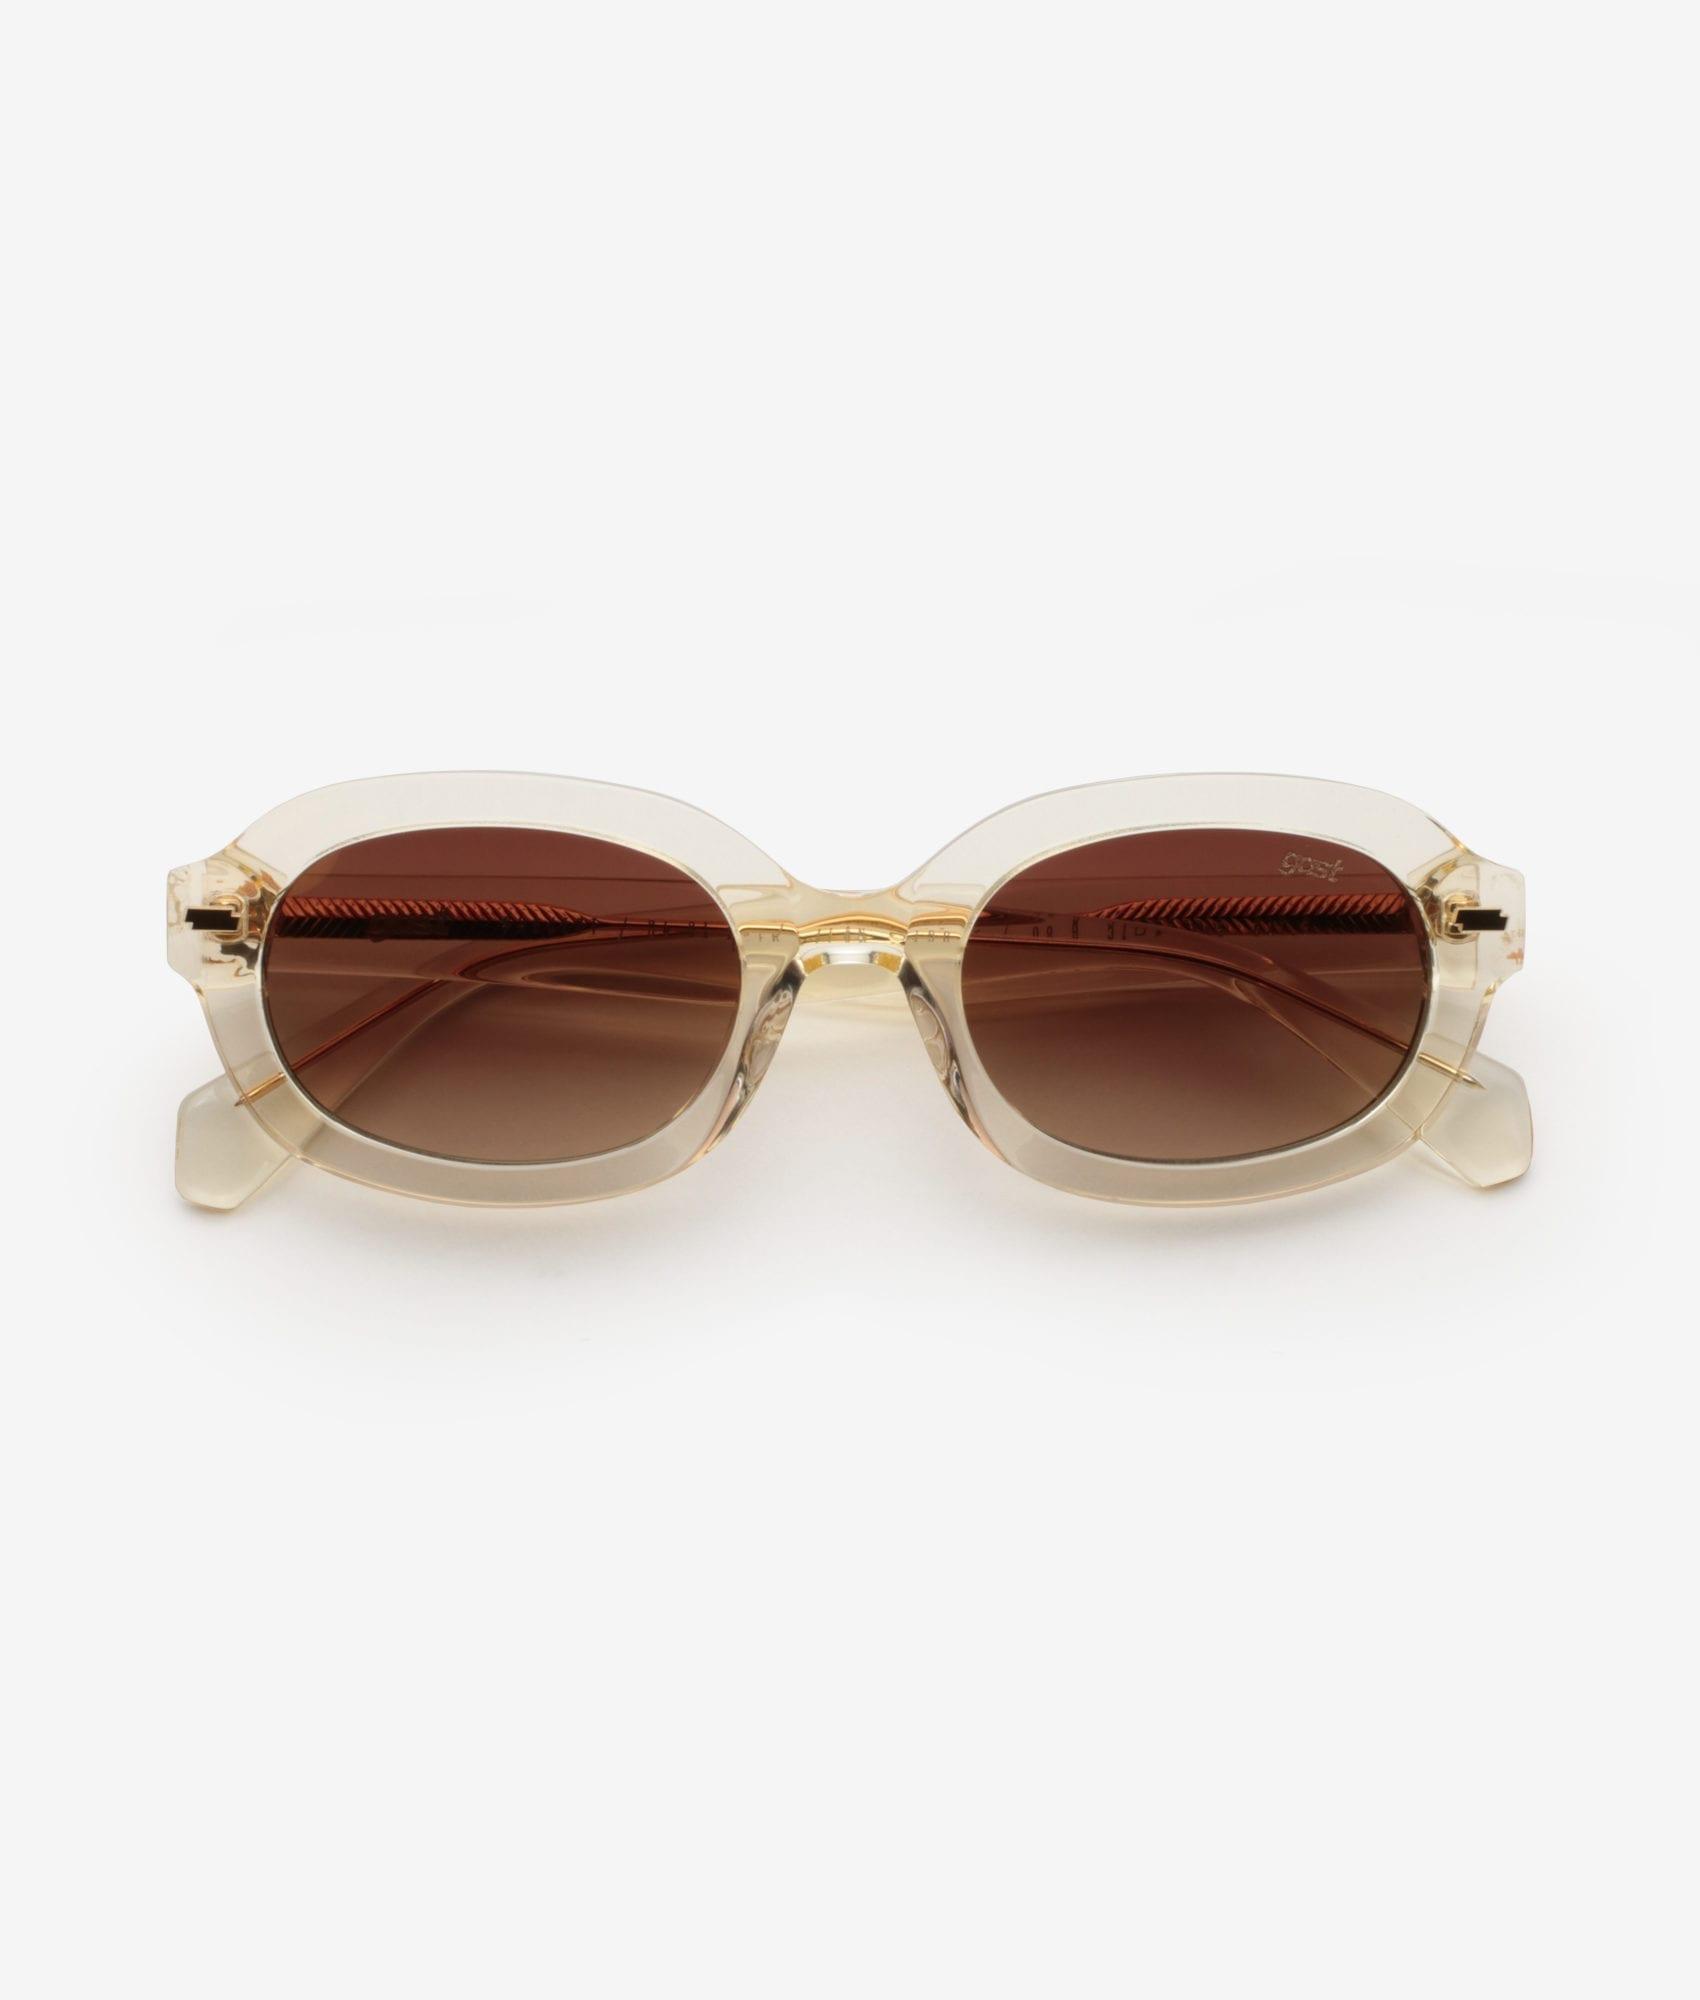 NSFK Champagne Gast Sunglasses